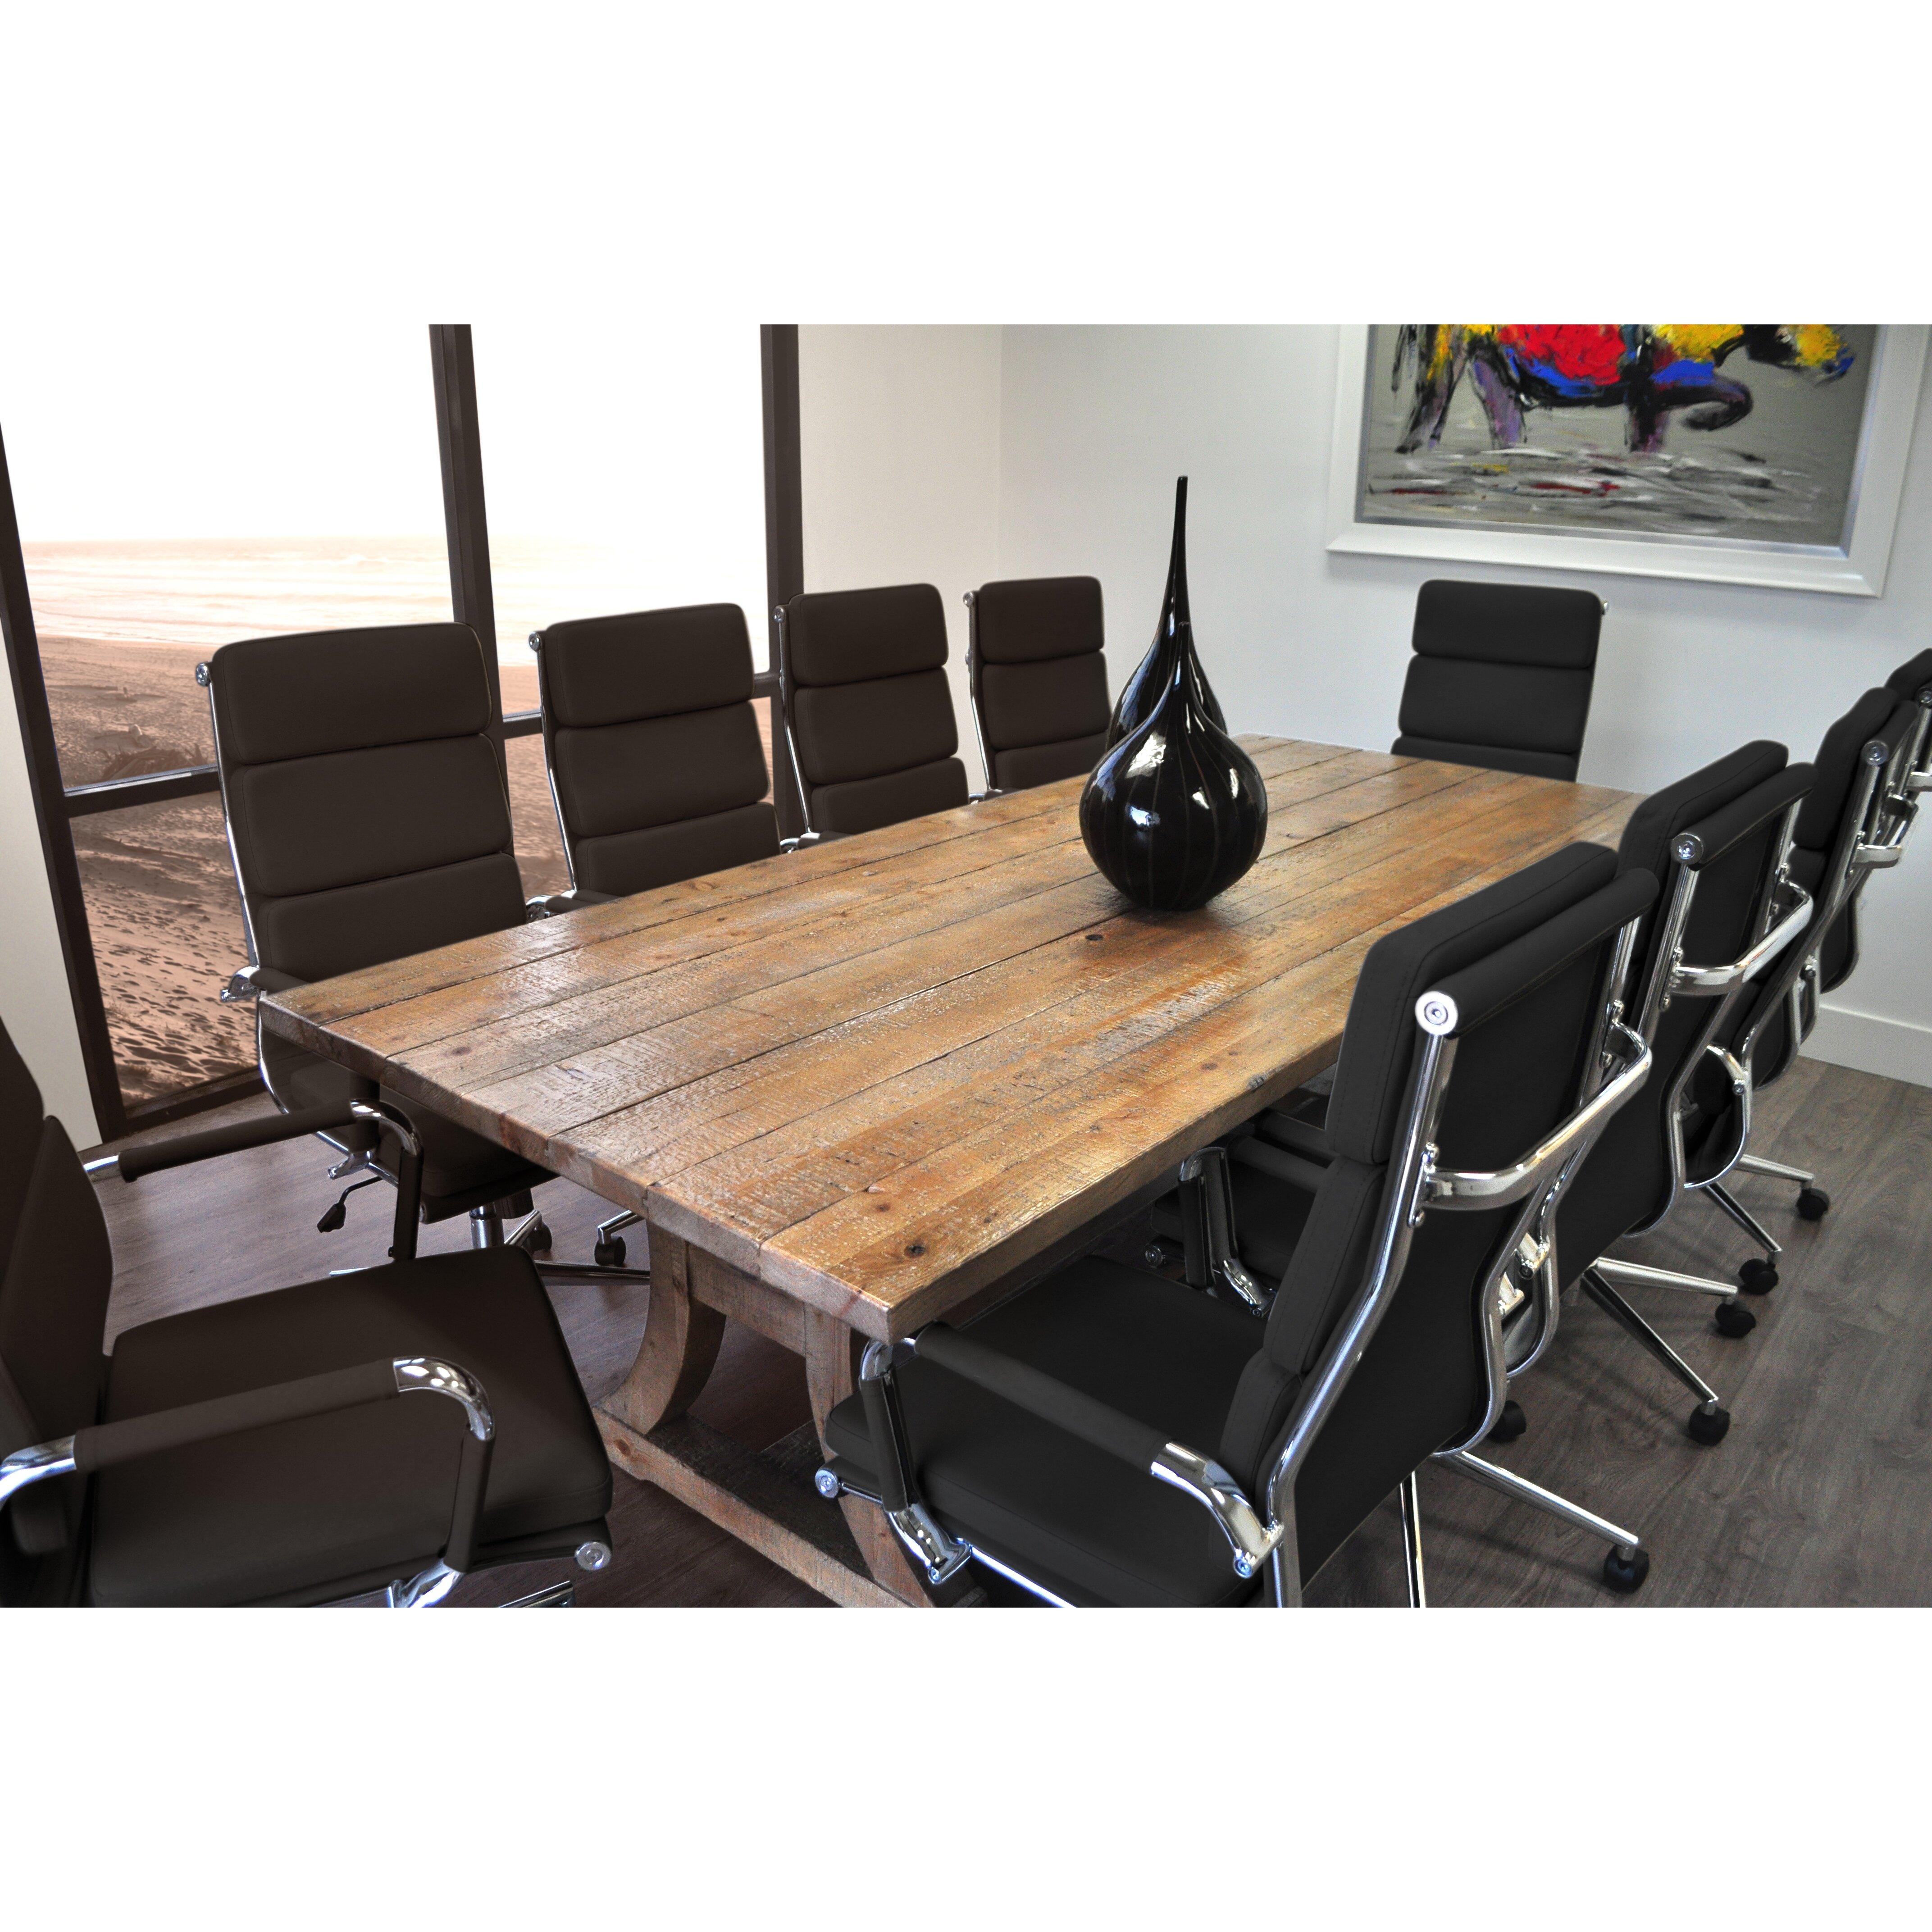 SolisPatio 11 Piece Ligna 8' Rectangular Conference Table Set & Reviews